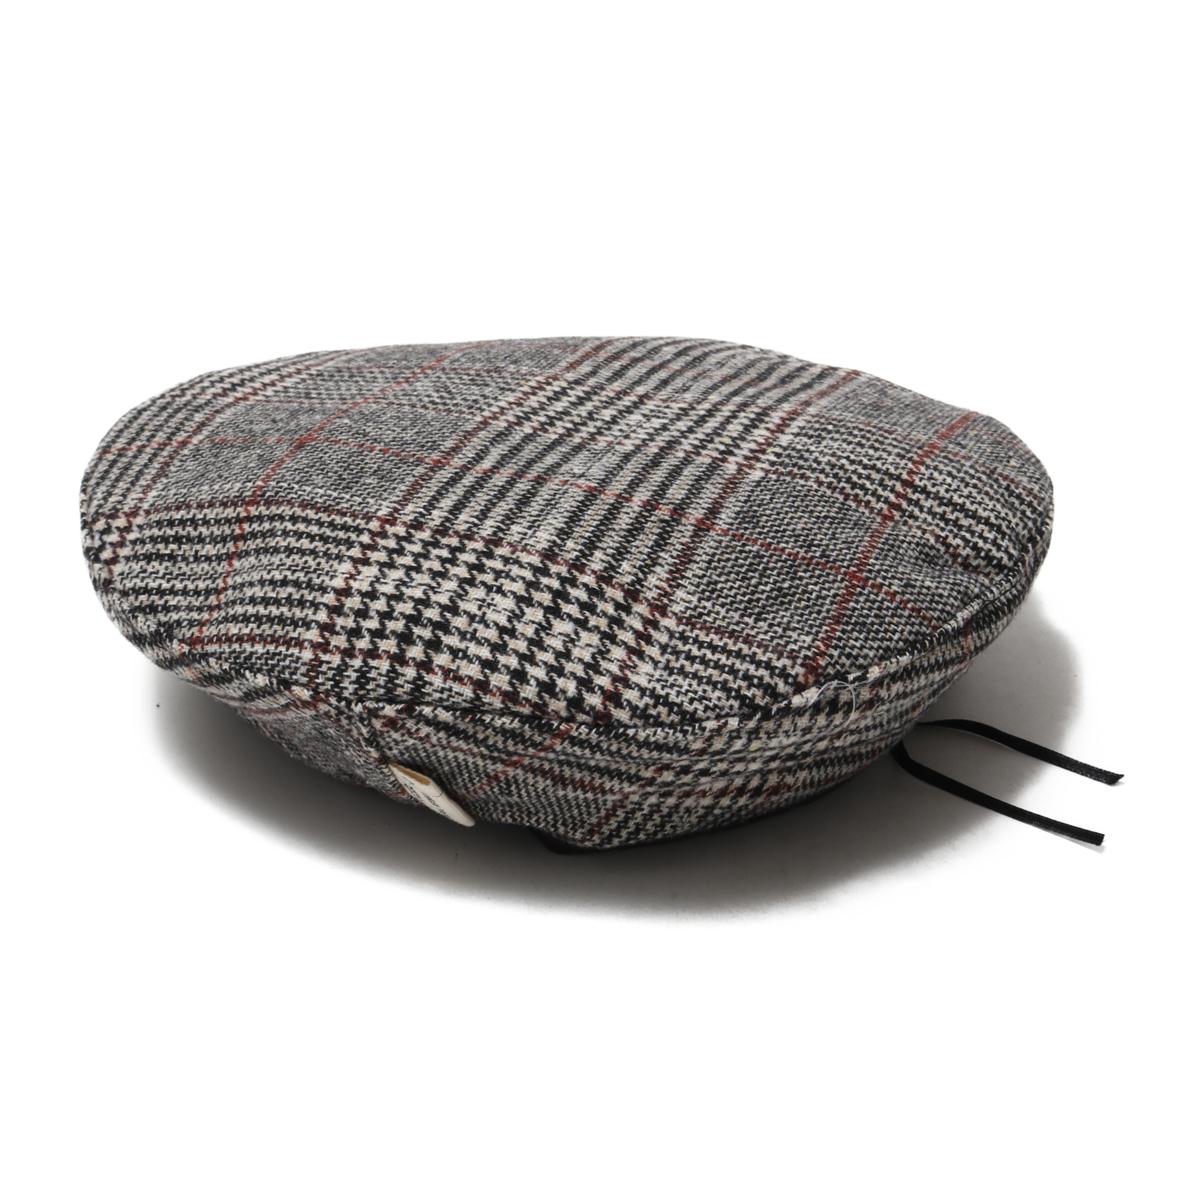 atmos pink check beret (atto- MOS pink check beret bow tie) GRAY 18FW-I